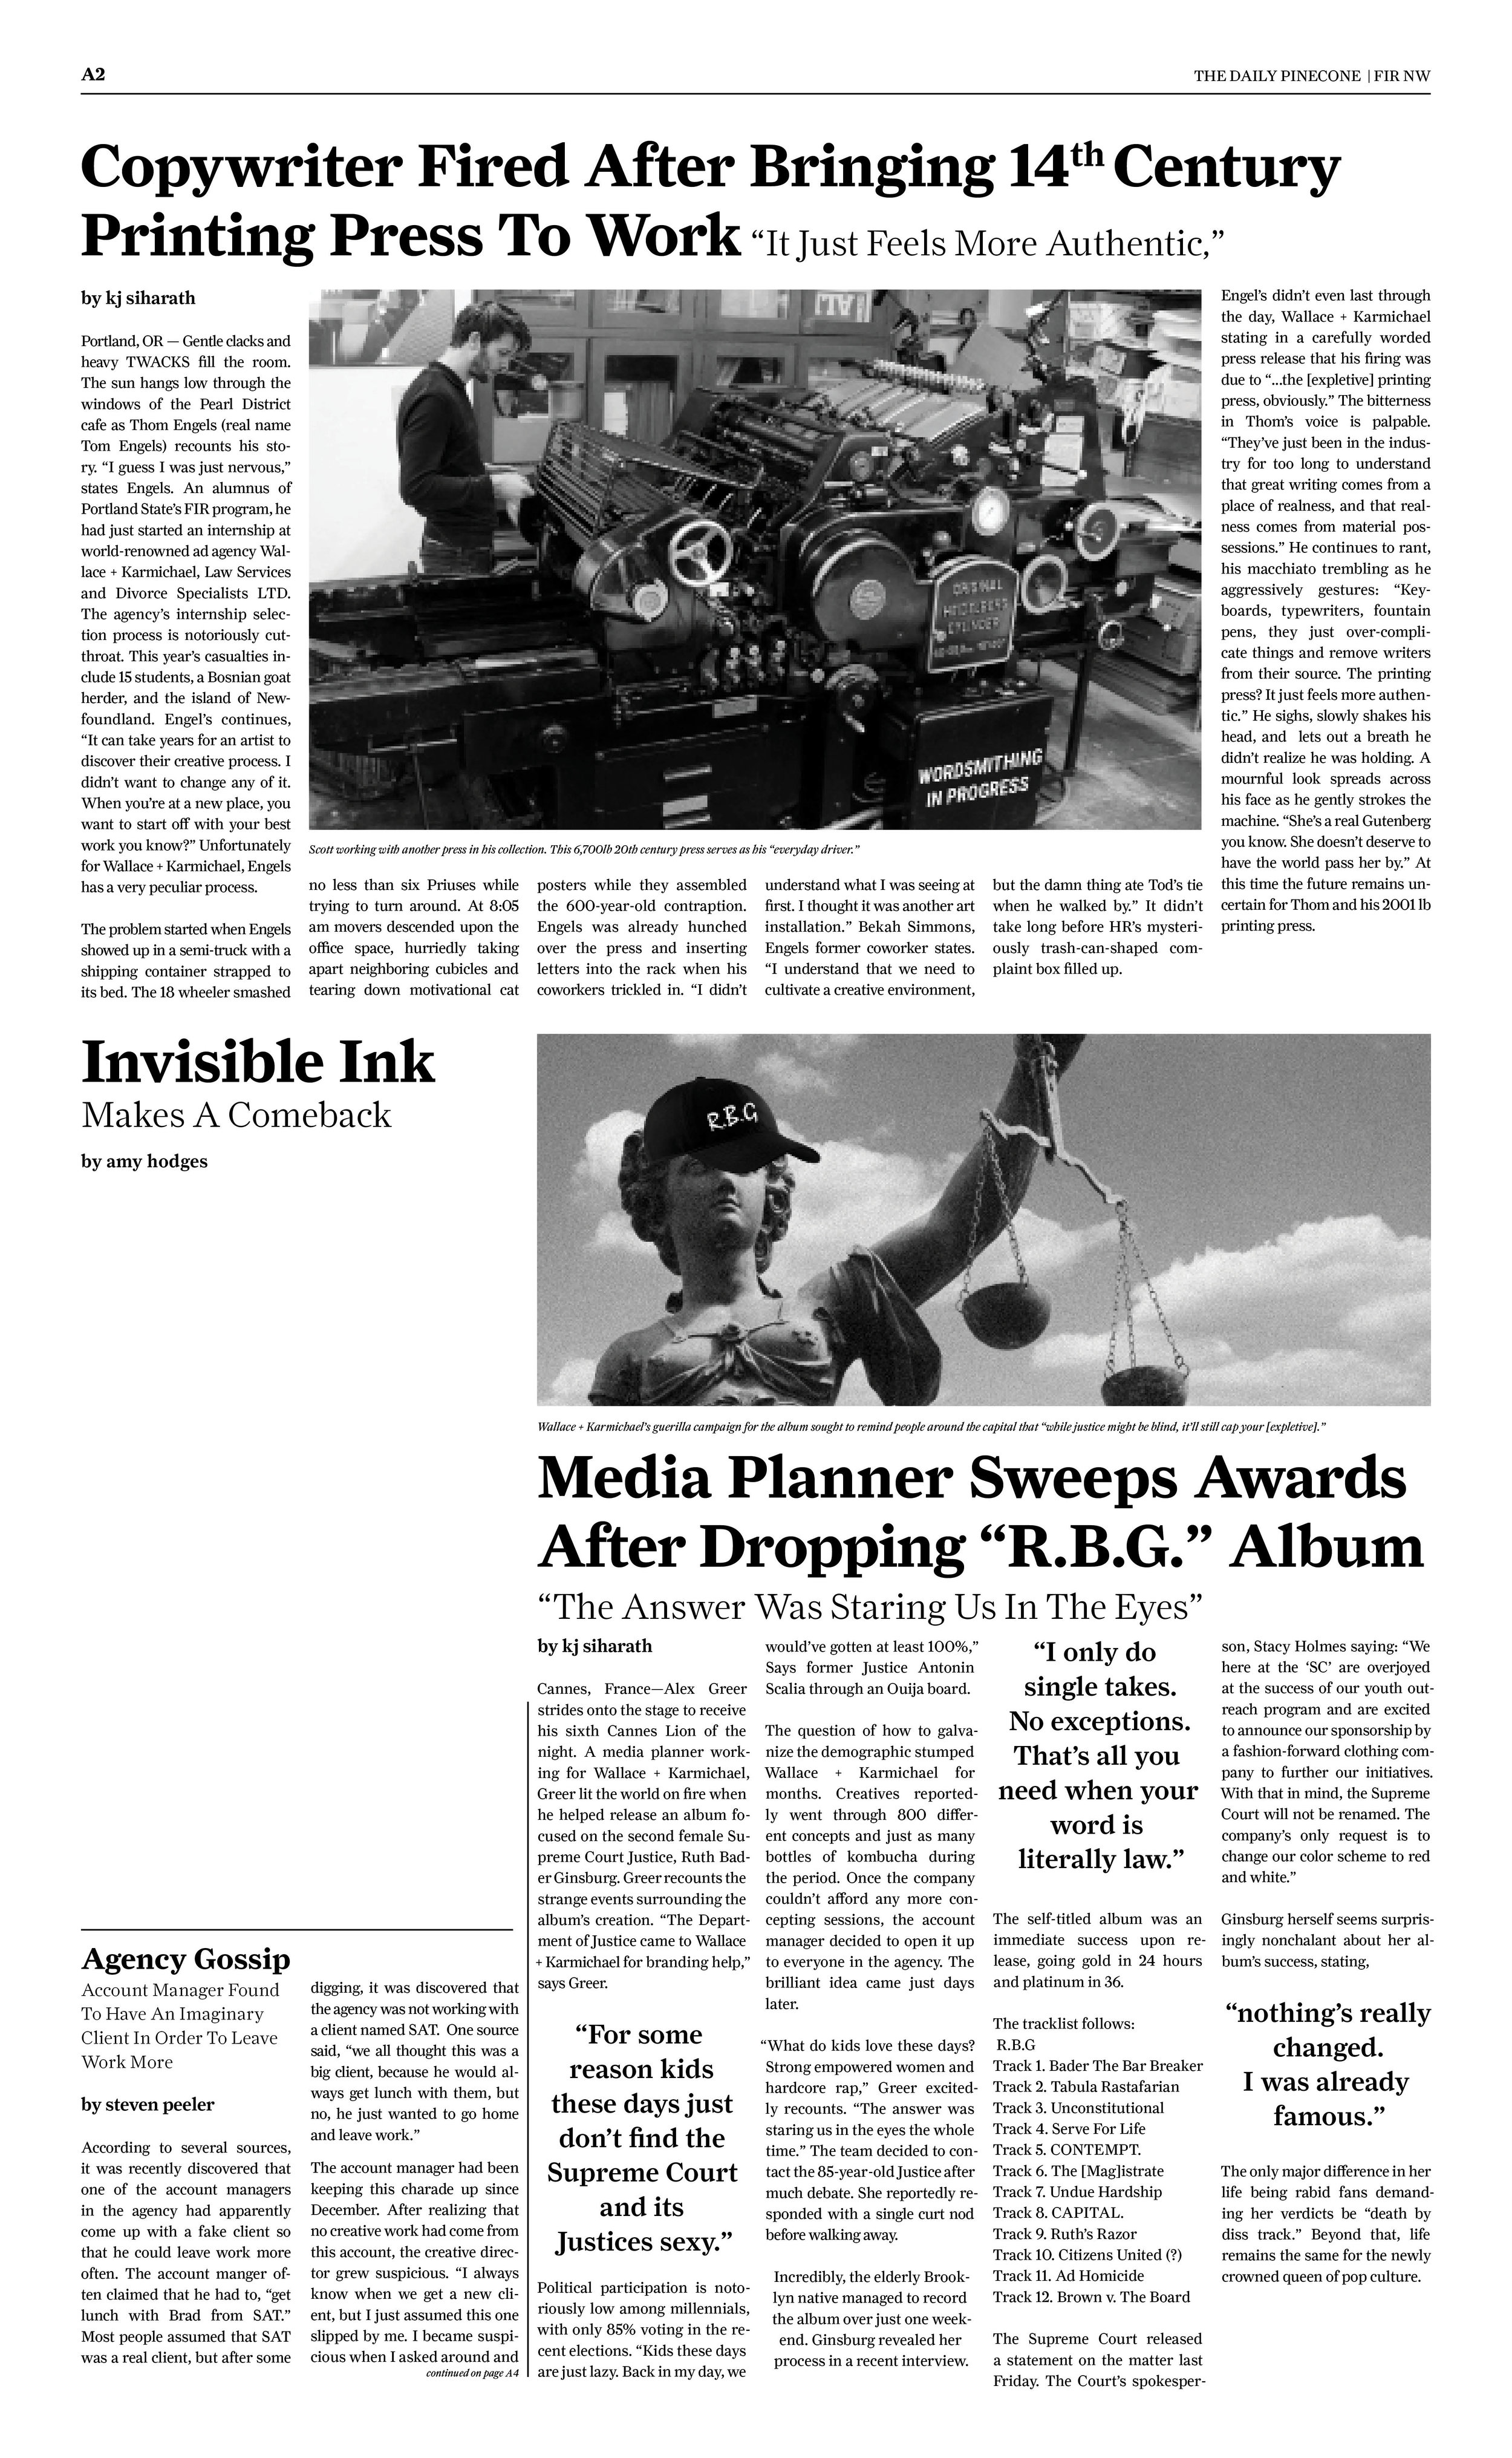 DailyPinecone_newspaper_r6 copy2.jpg